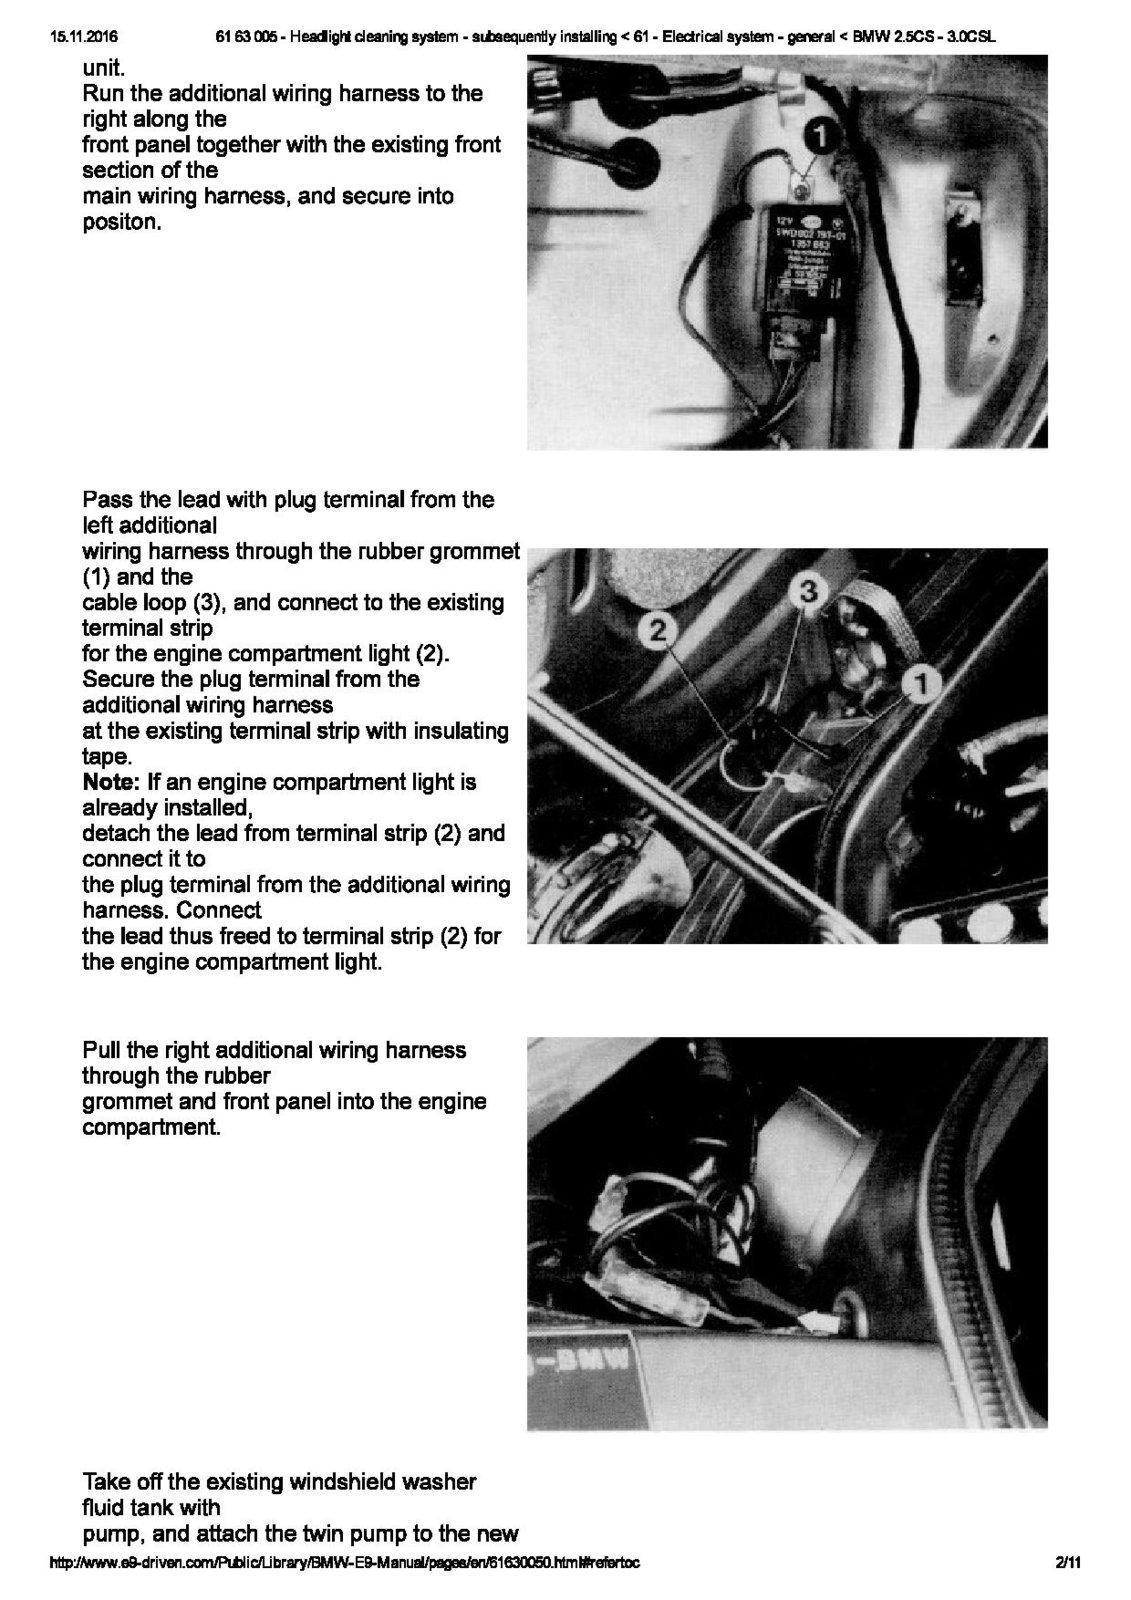 321-page-002.jpg